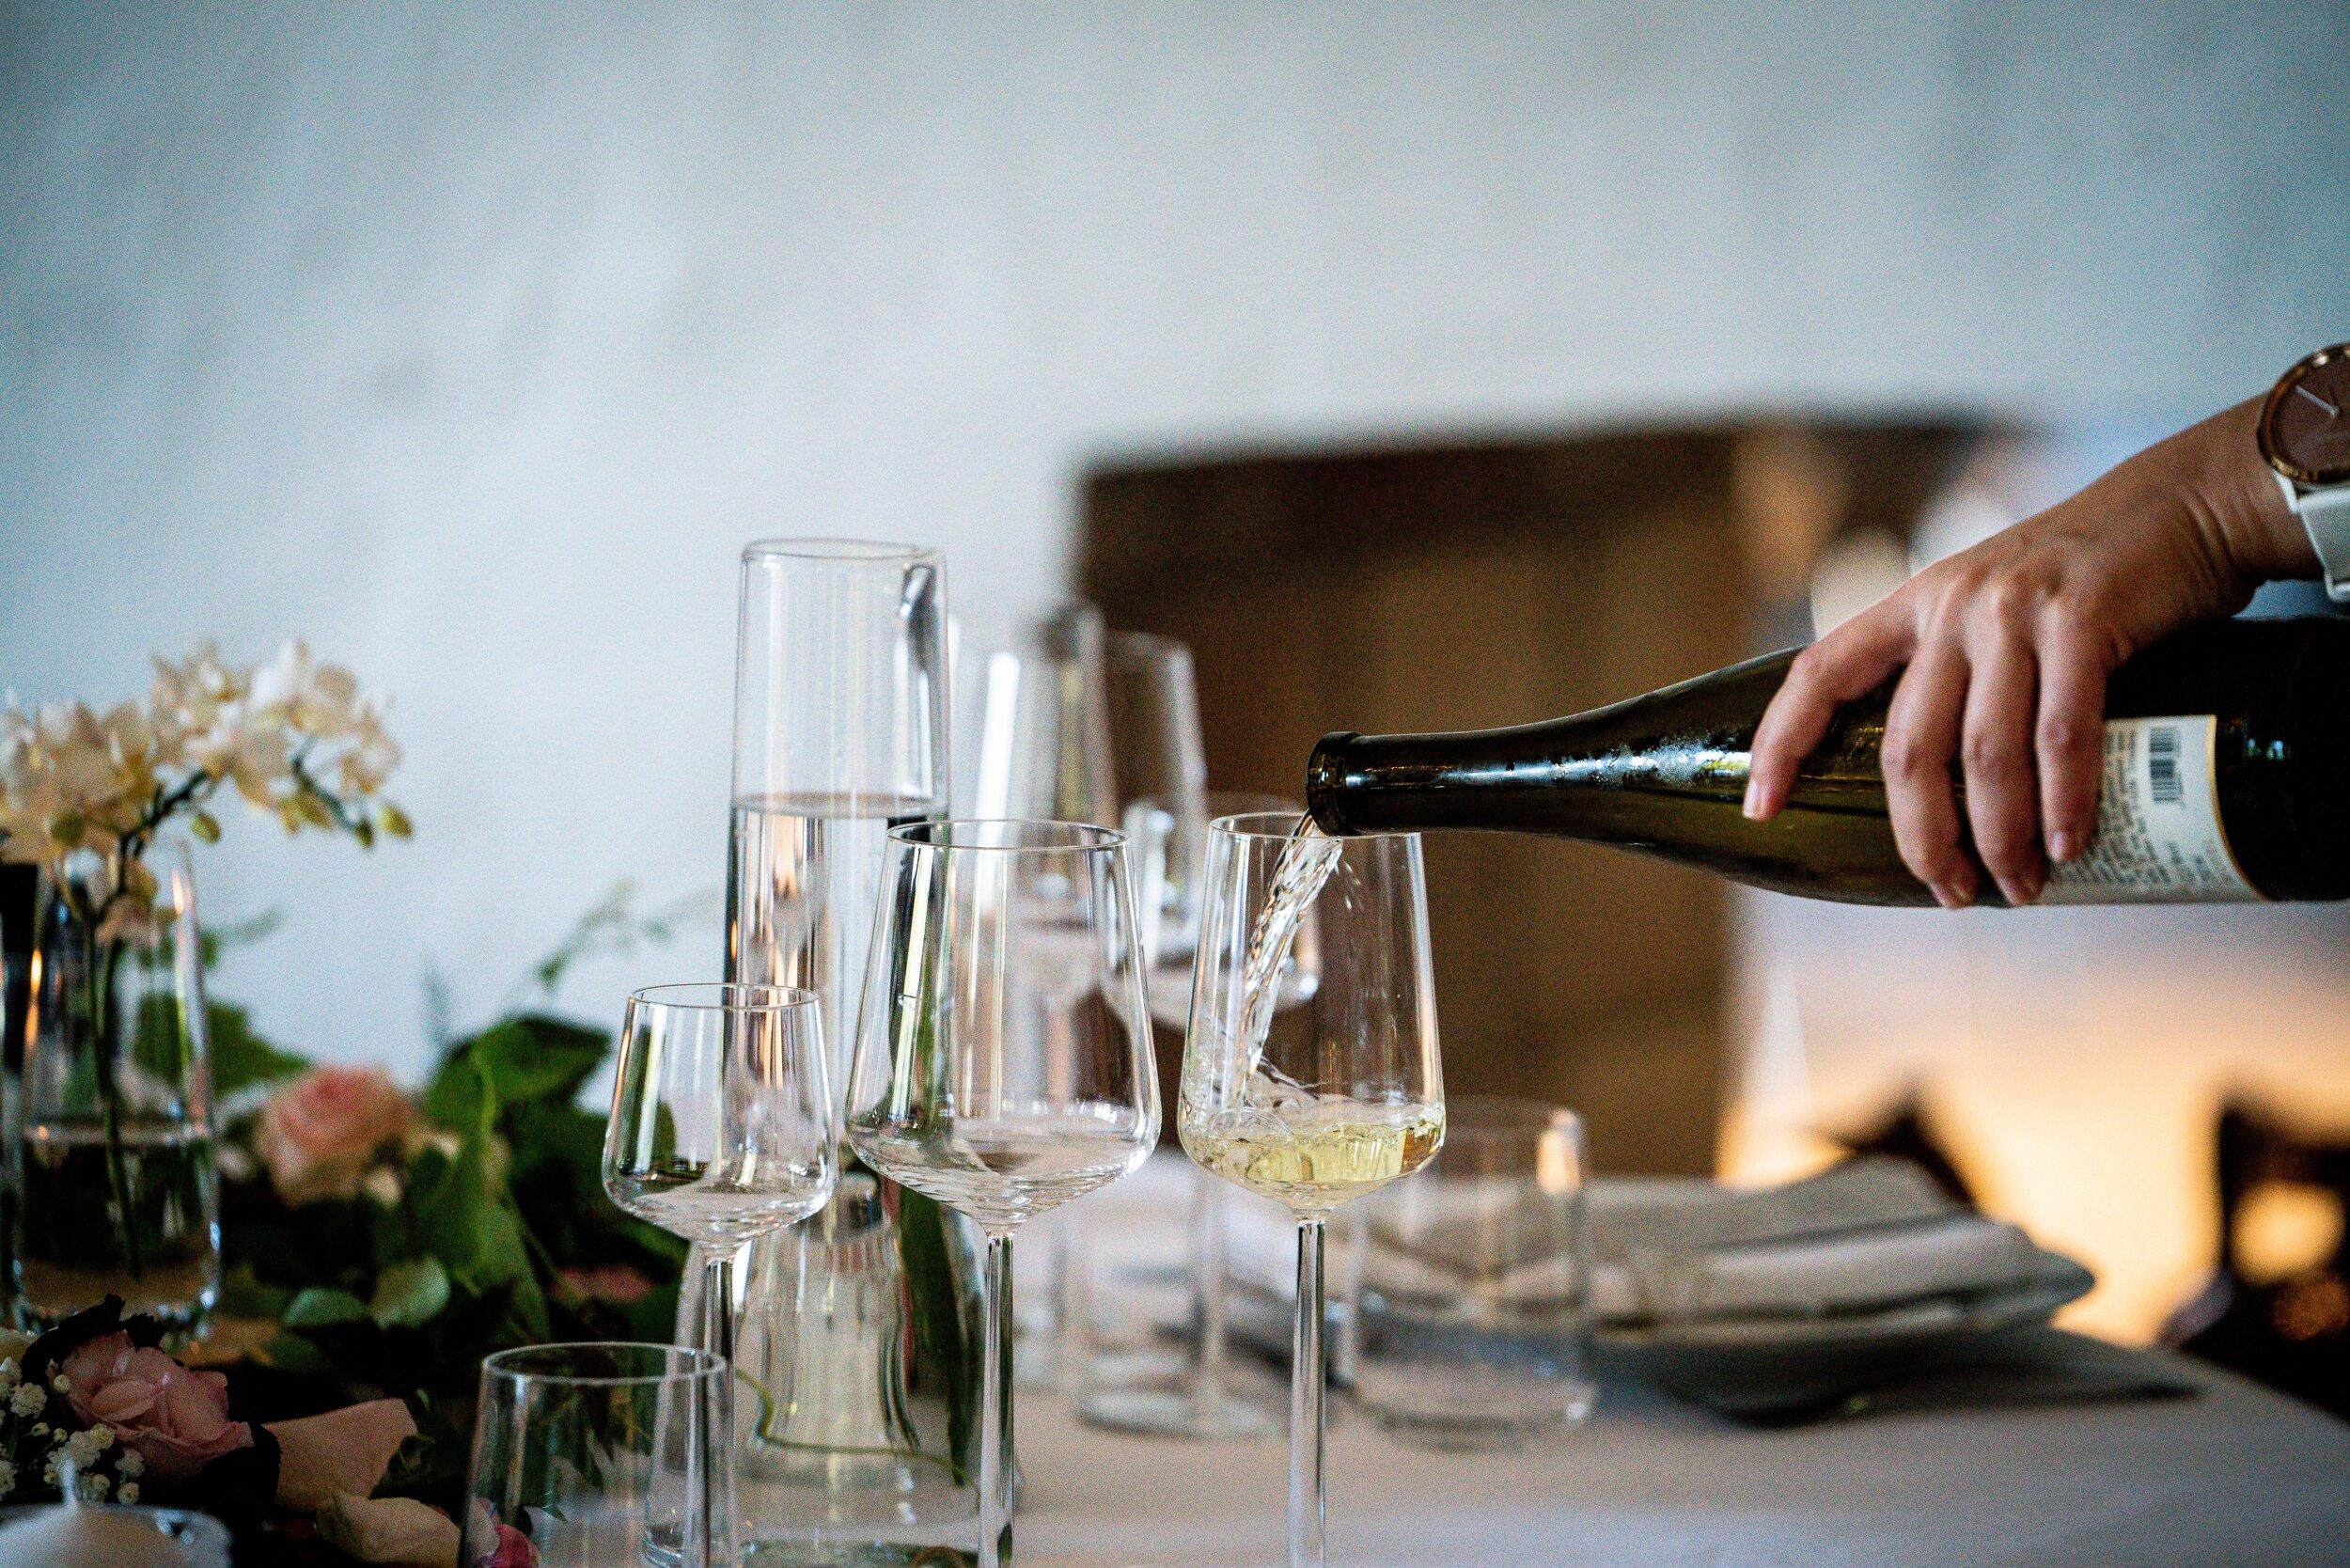 alcohol-alcoholic-beverage-beverage-2995283.jpg